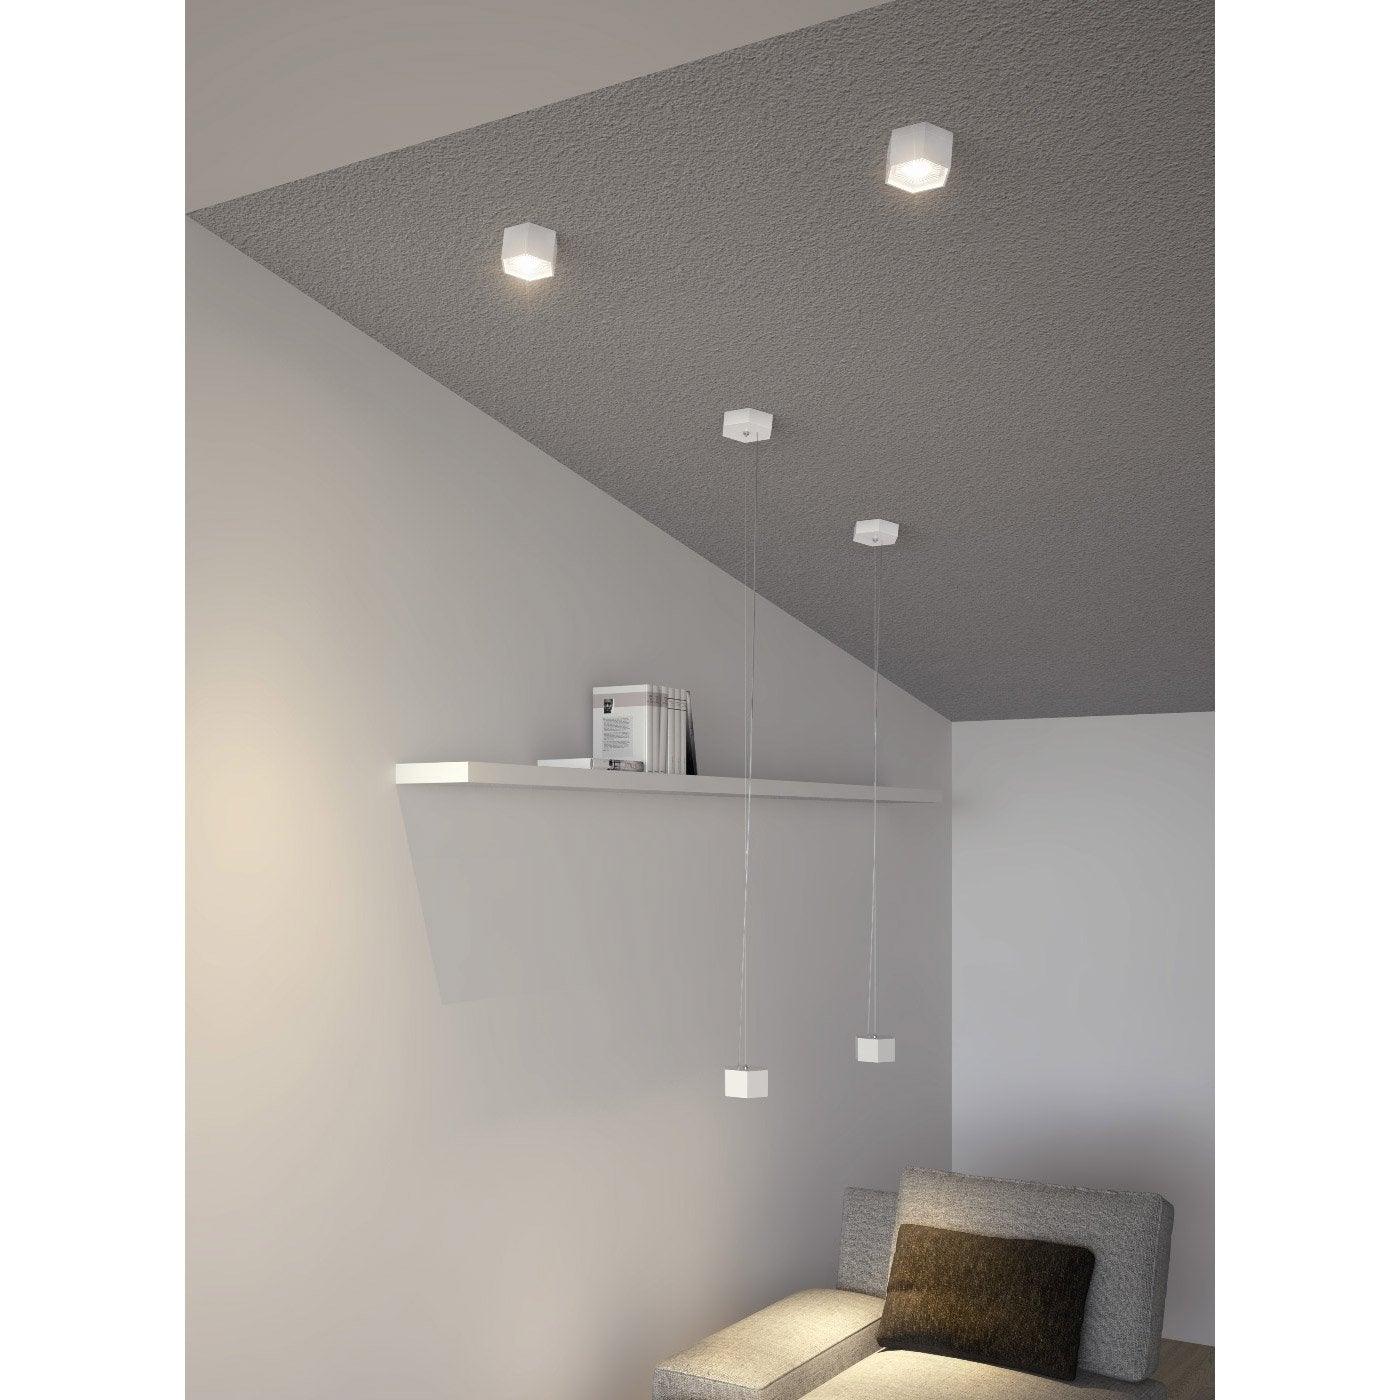 plafonnier salle de bain leroy merlin top attrayant. Black Bedroom Furniture Sets. Home Design Ideas